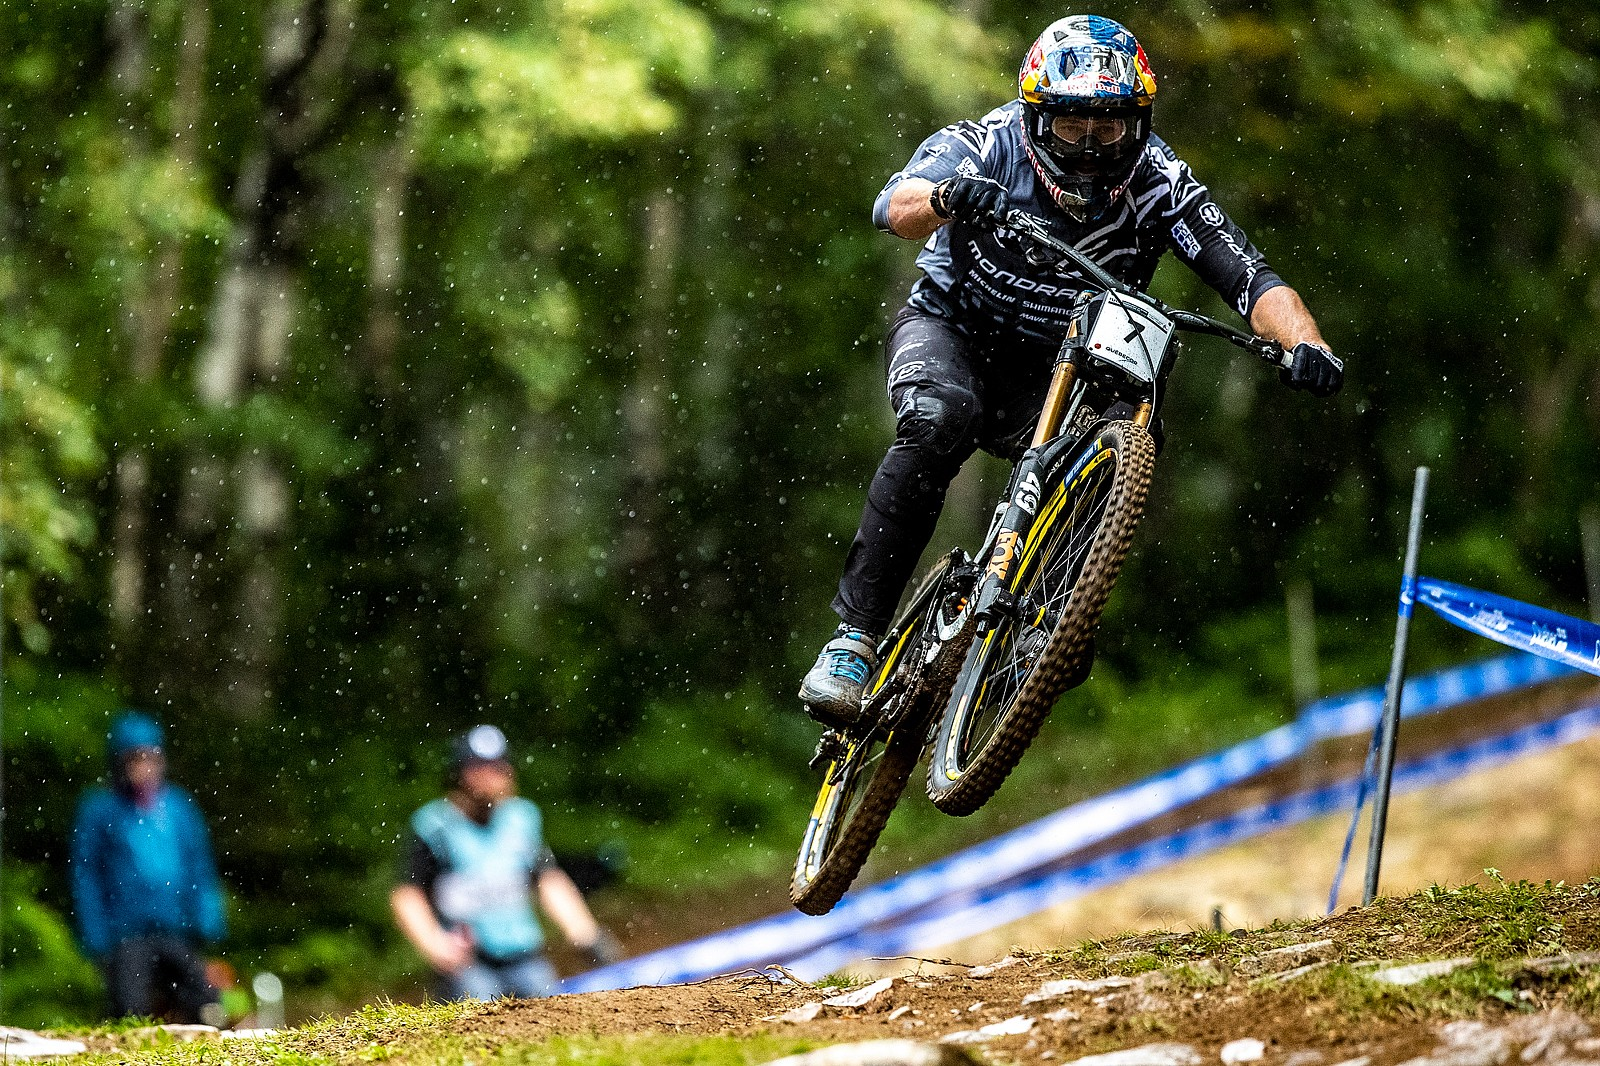 Parting the Rain at Warp Speed, Brook Macdonald - A Big Bad Batch of Brook Macdonald Bangers - Mountain Biking Pictures - Vital MTB